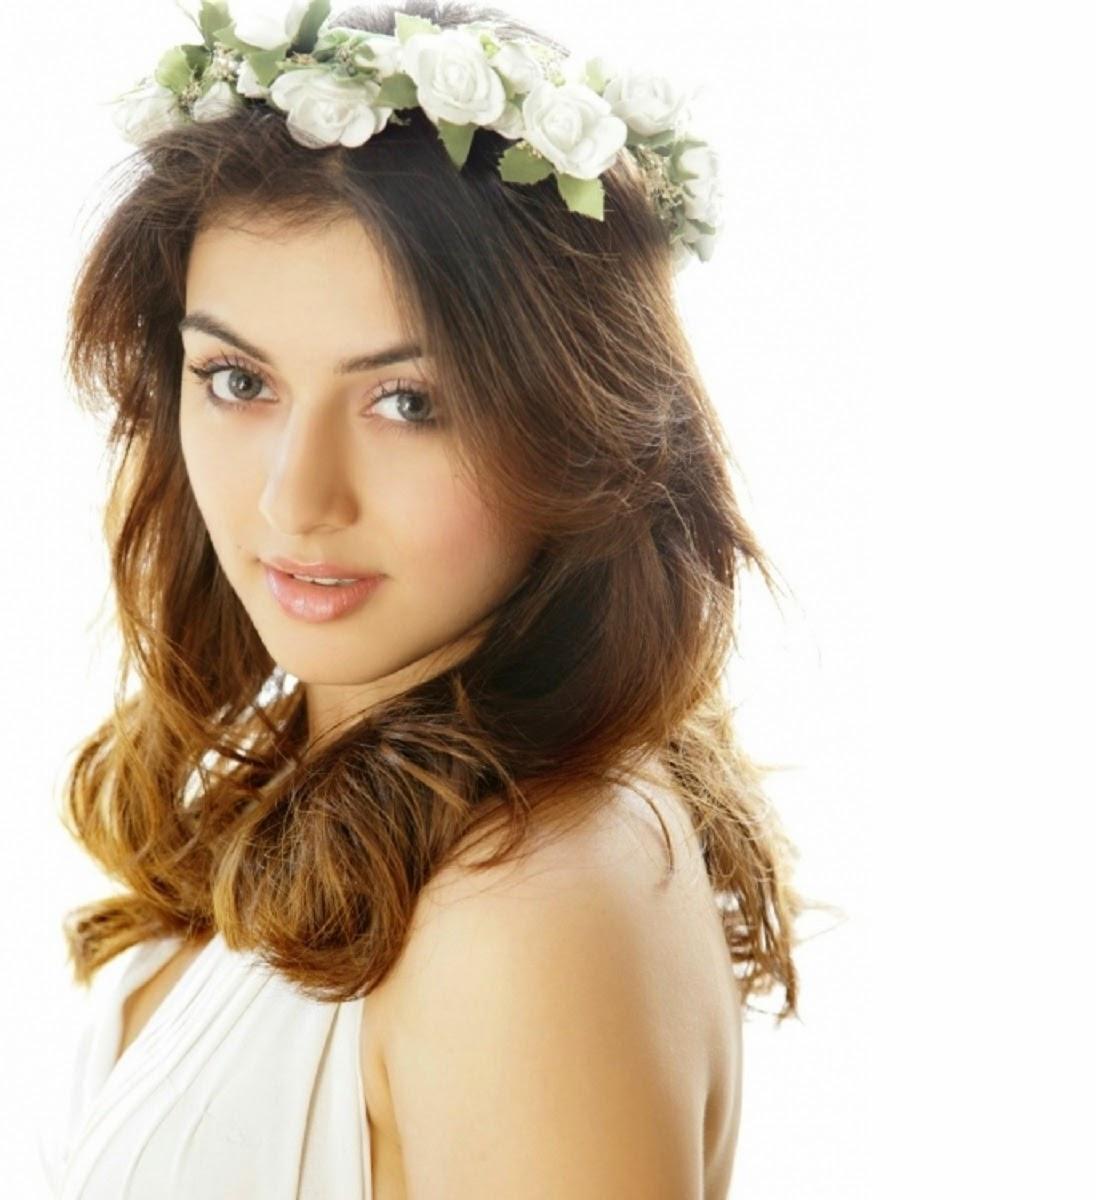 Looking Good Wallpaper: Good Looking Tamil Actress Hansika Motwani HD Wallpaper